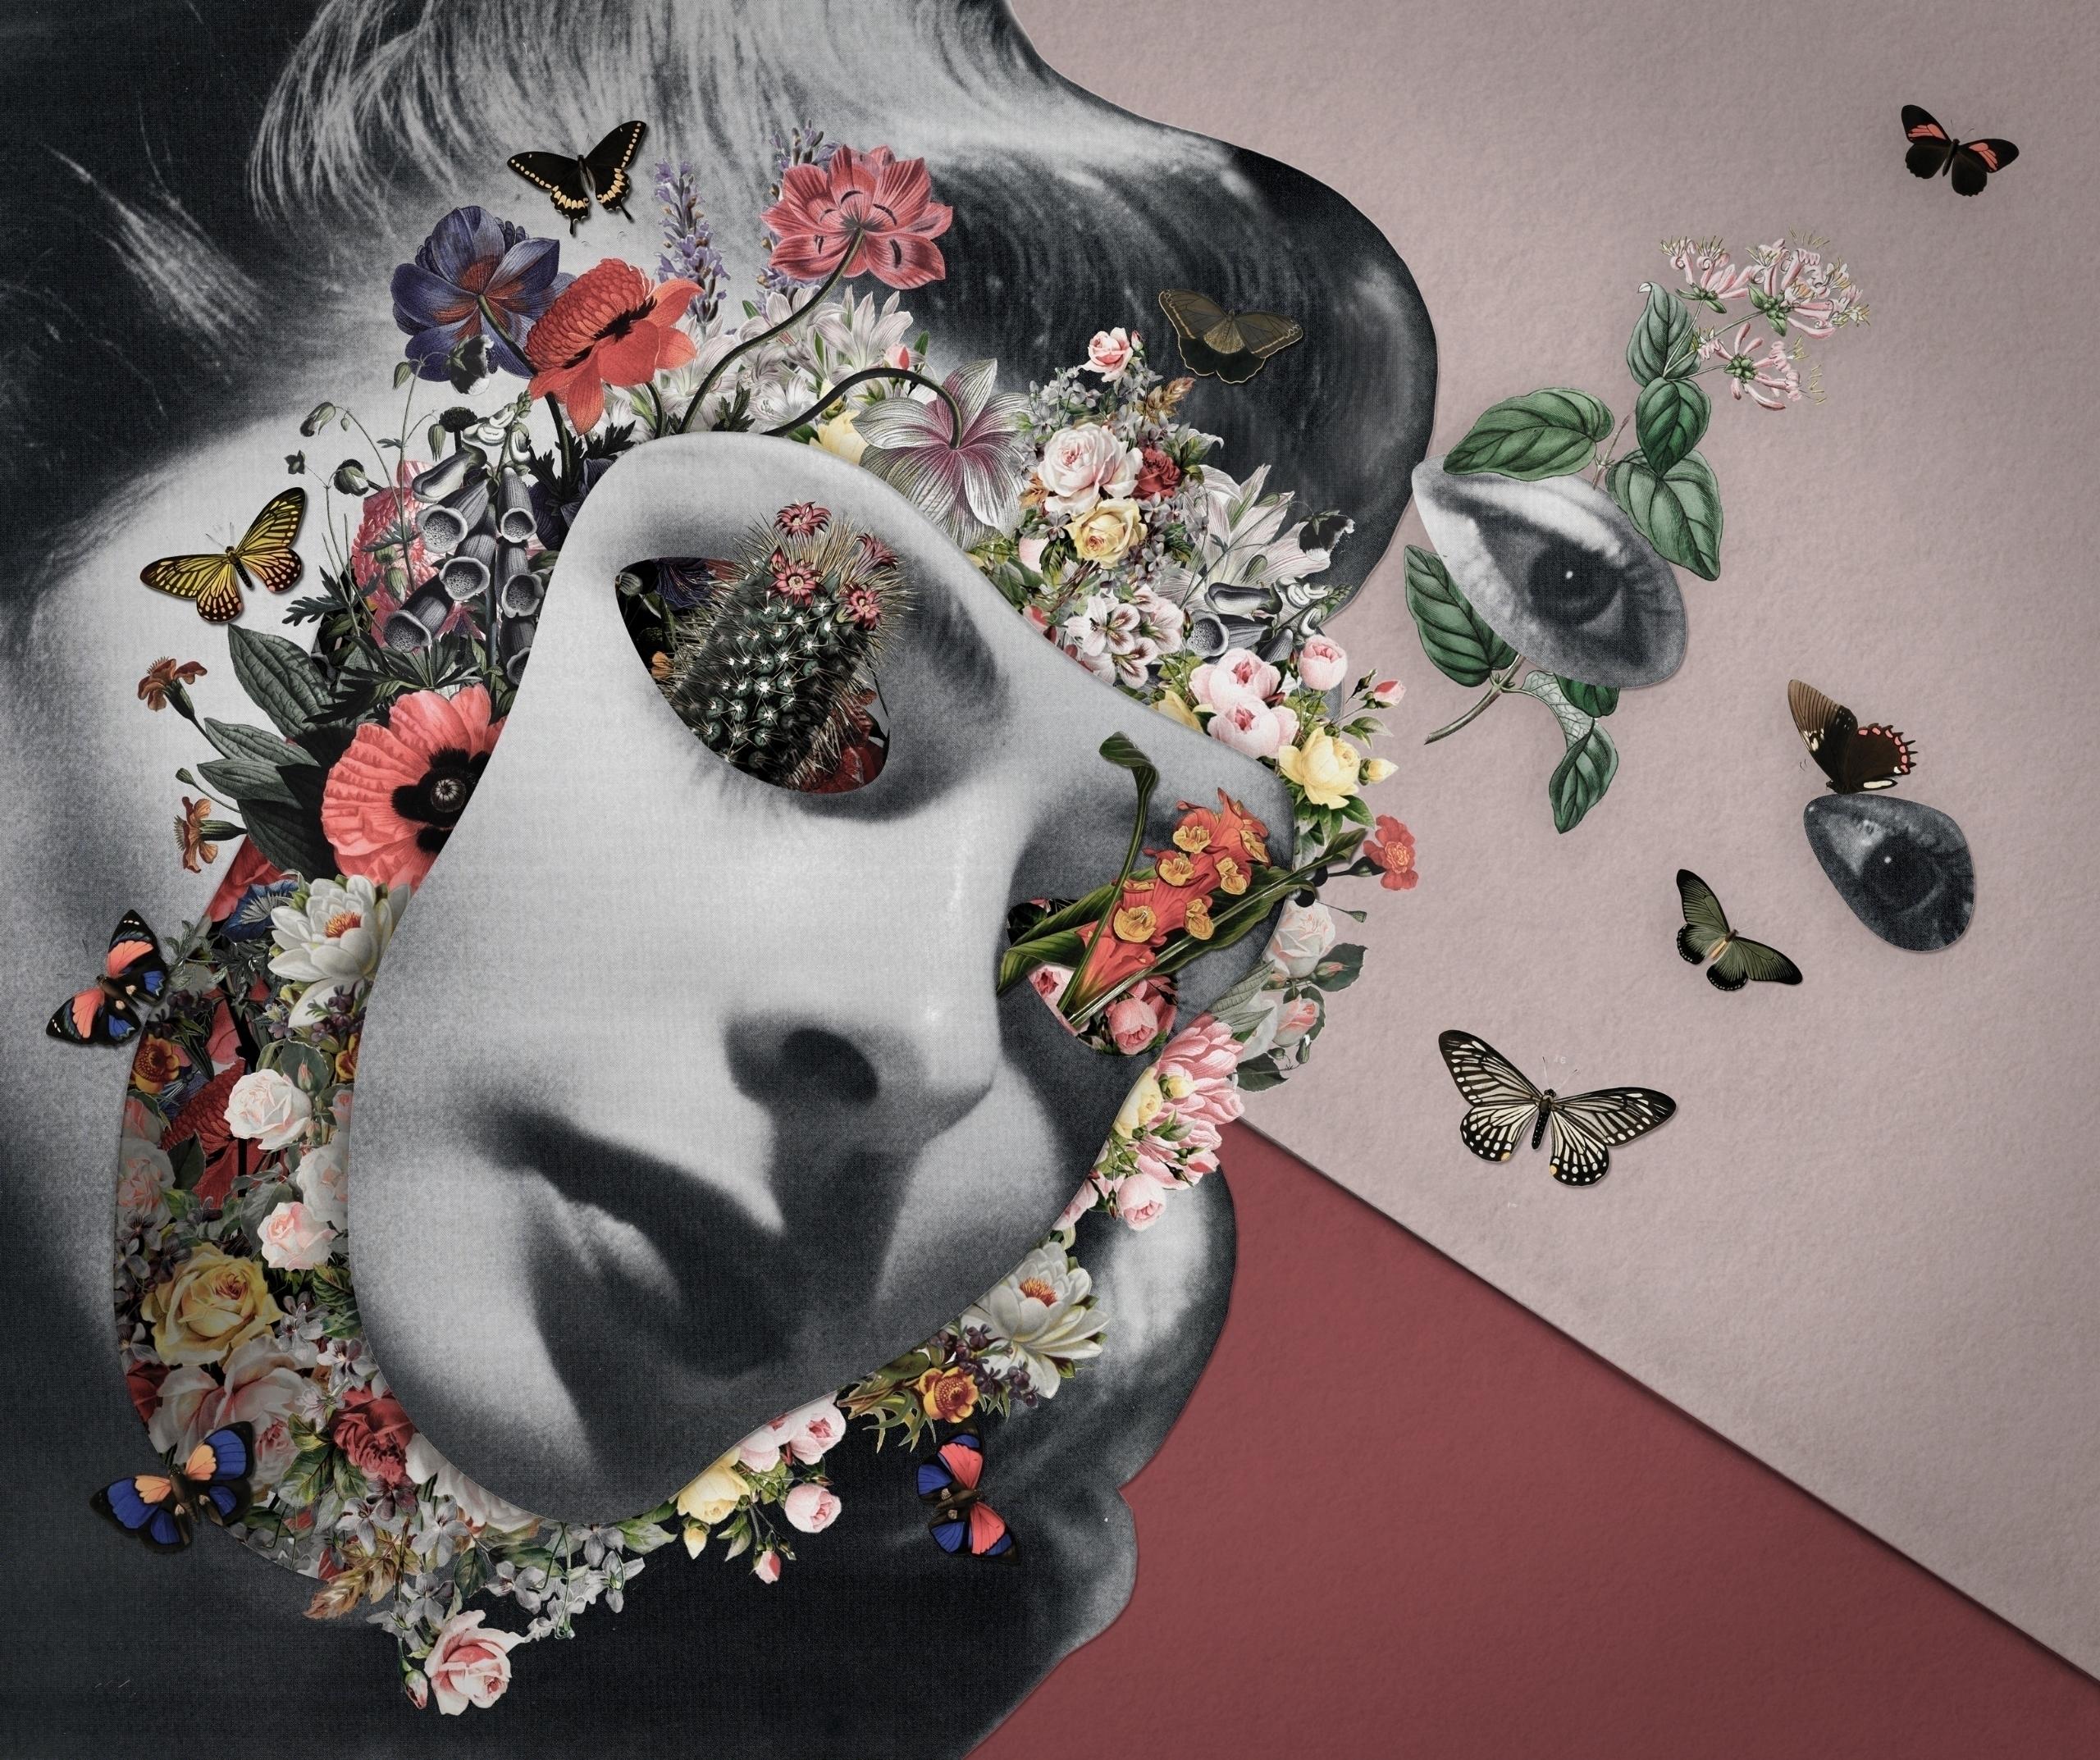 Paper collage 31 - collageart, collageartist - santasombra | ello